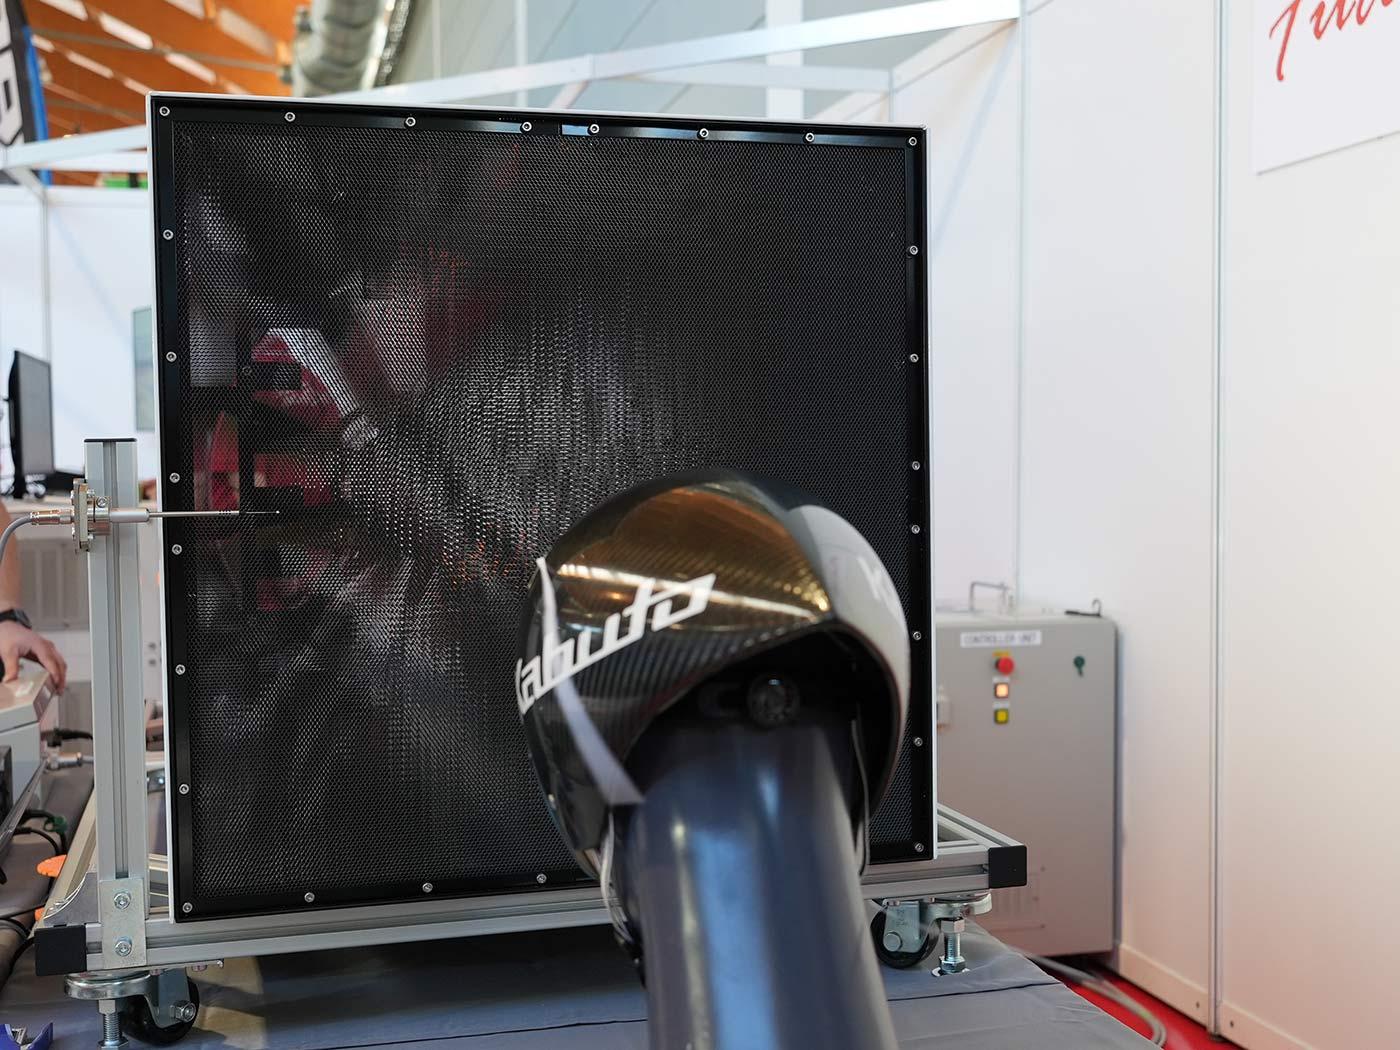 mini wind tunnel for small parts aerodynamic testing